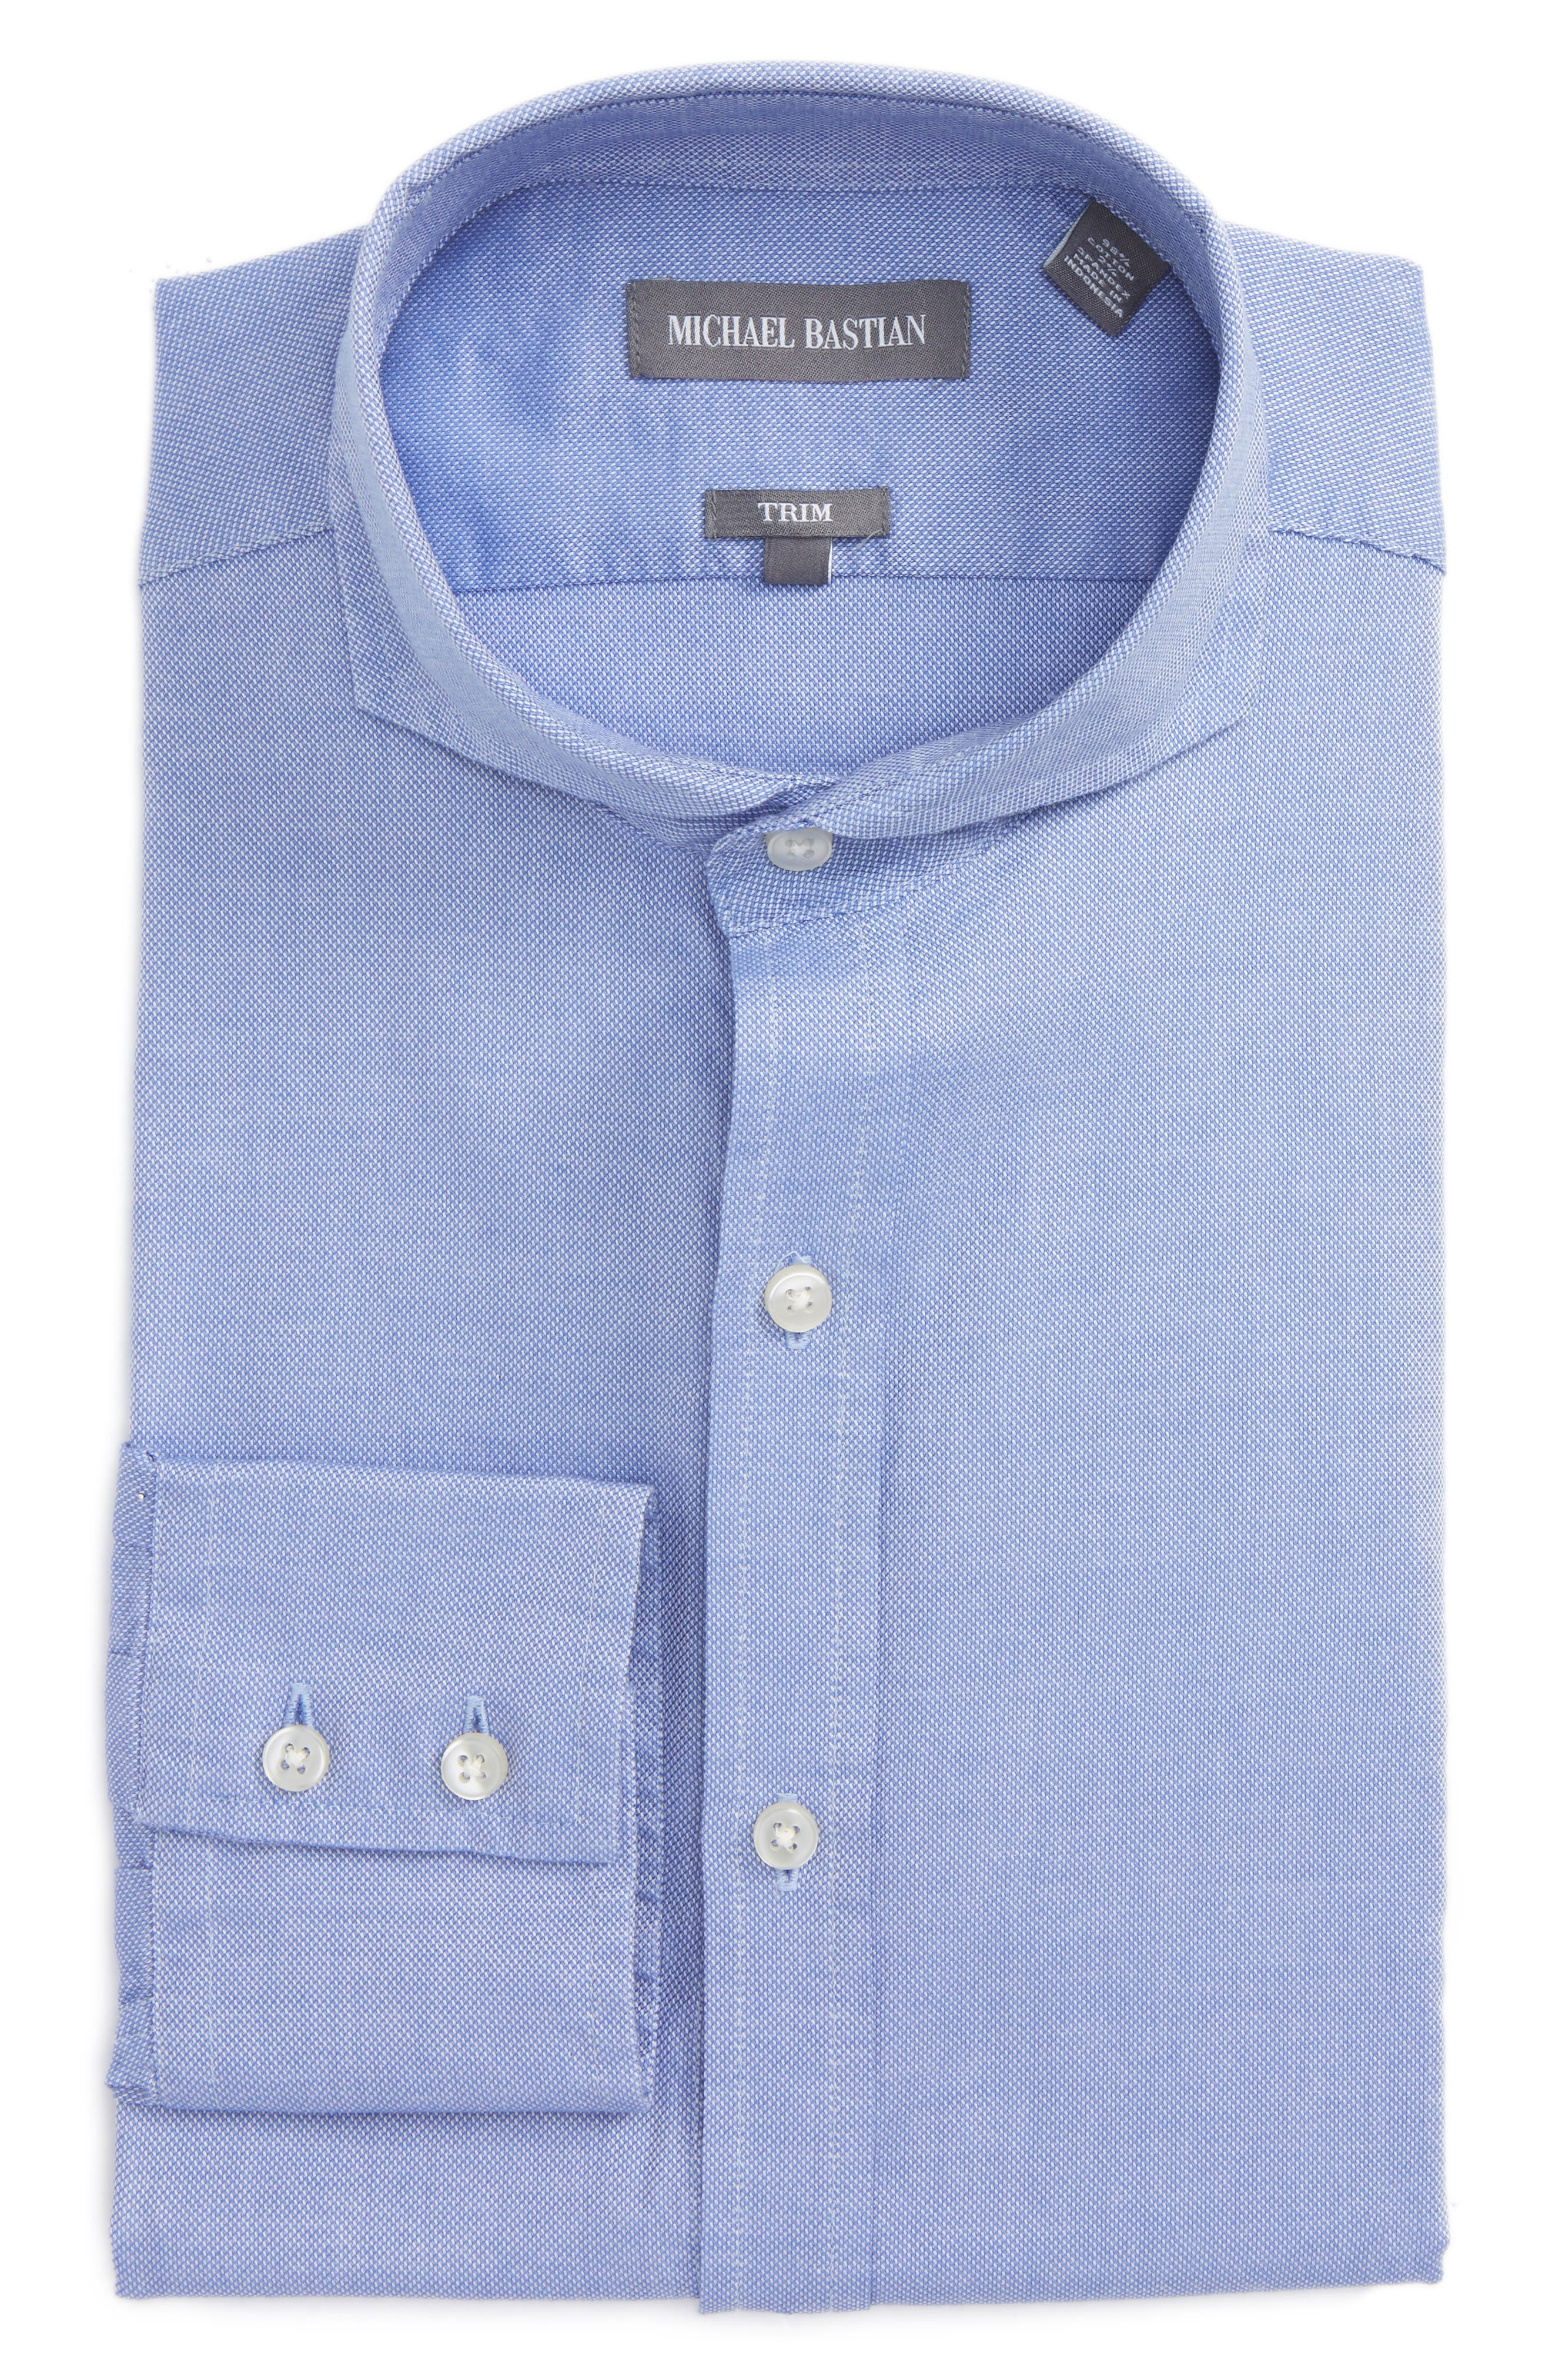 Michael Bastian Trim Fit Oxford Dress Shirt